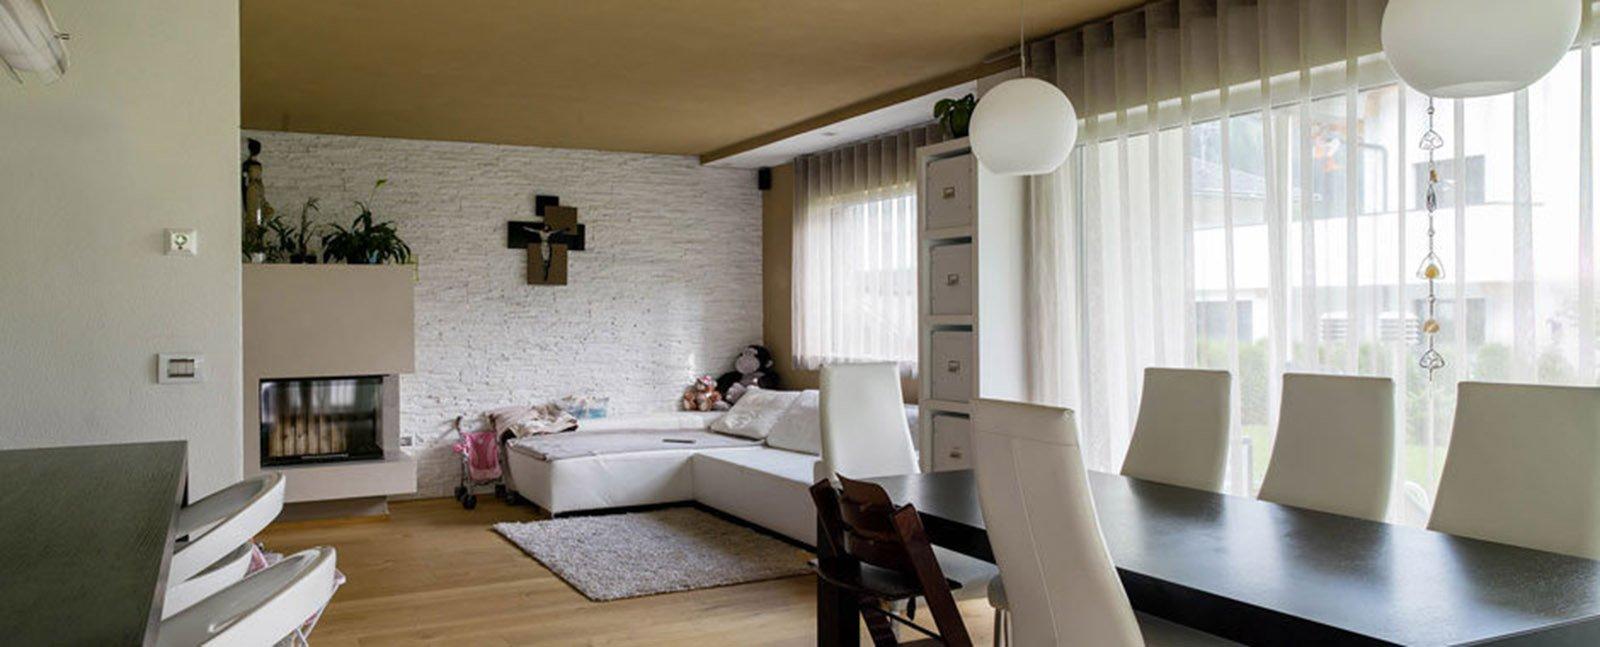 Bioarchitettura e case ecologiche prefabbricate in legno - Case prefabbricate interni ...